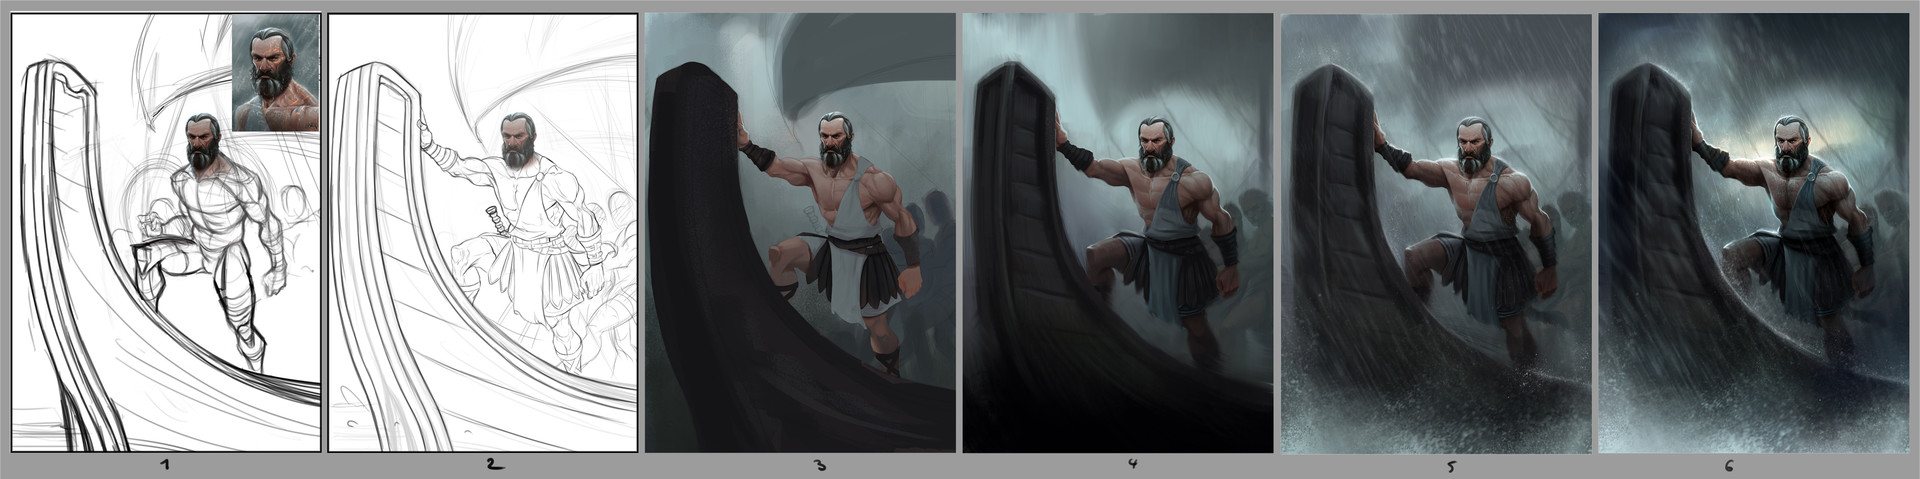 Erkan karagoez odysseus illustration process